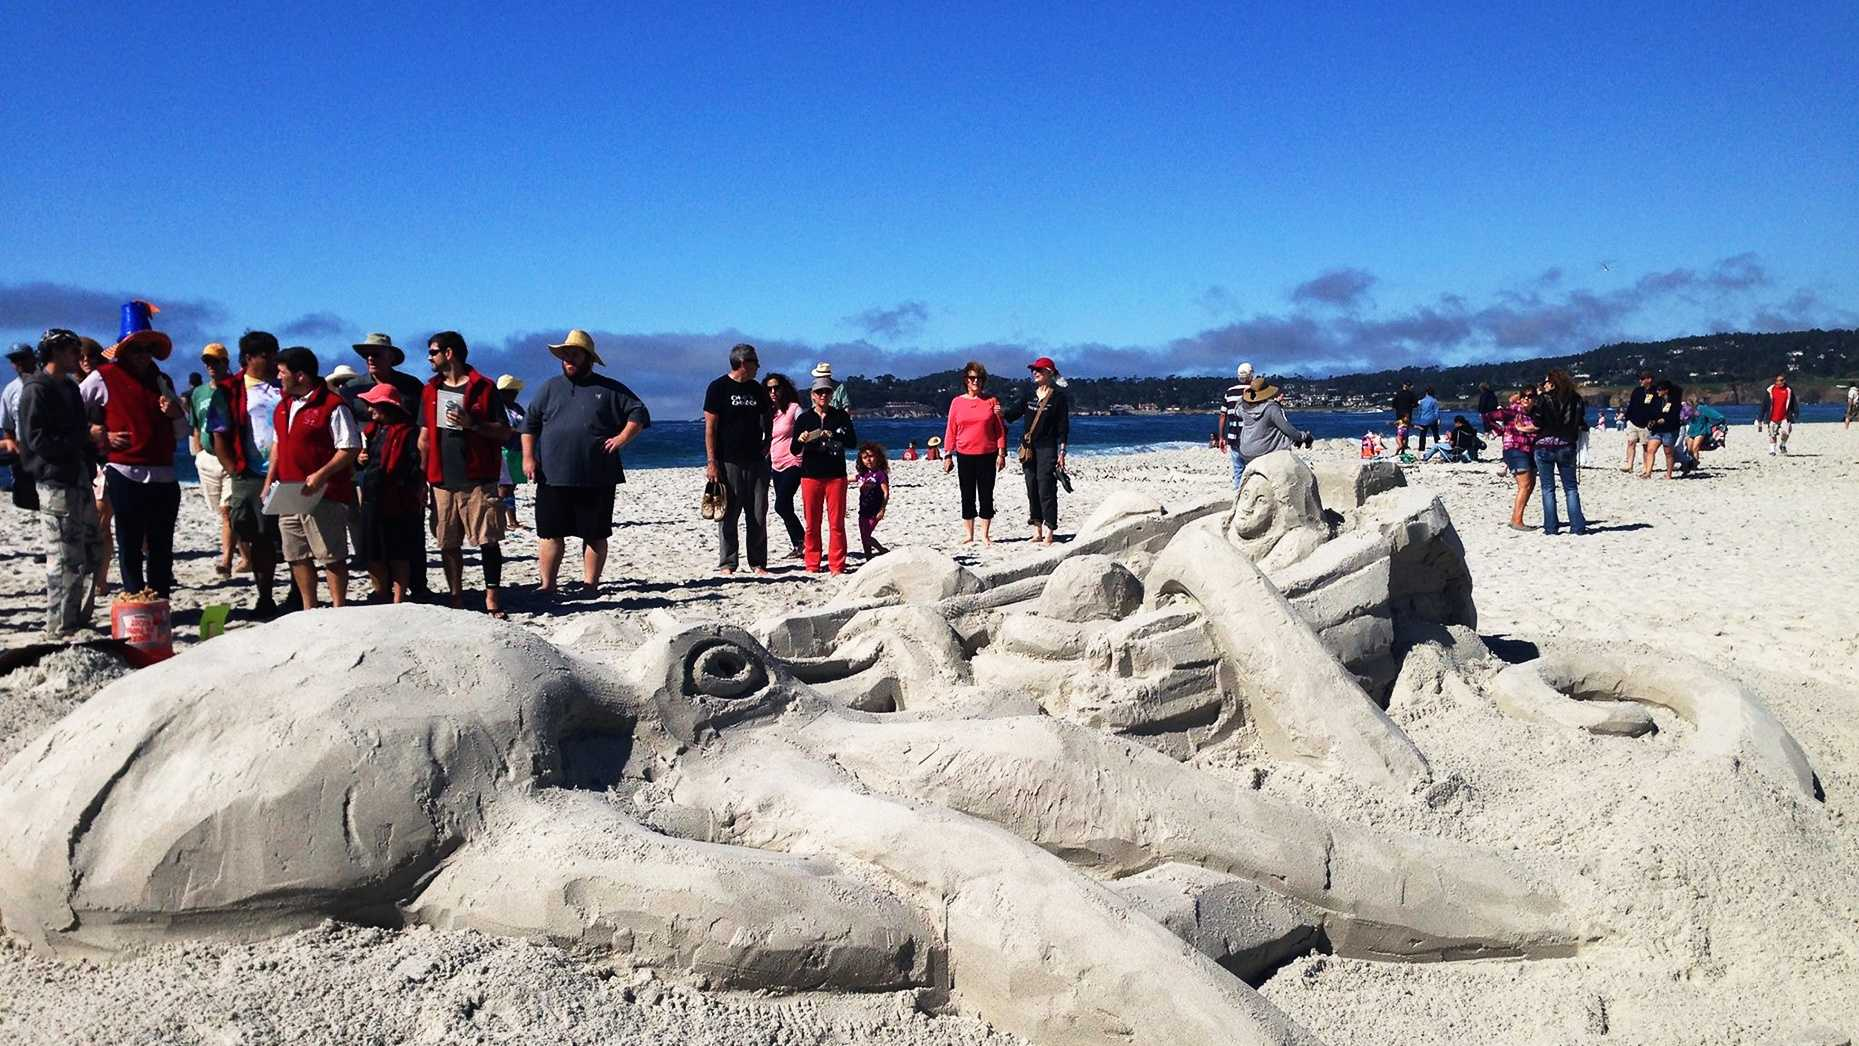 This octopus sand sculpture won 1st place at Carmel Beach. (Oct. 2014)